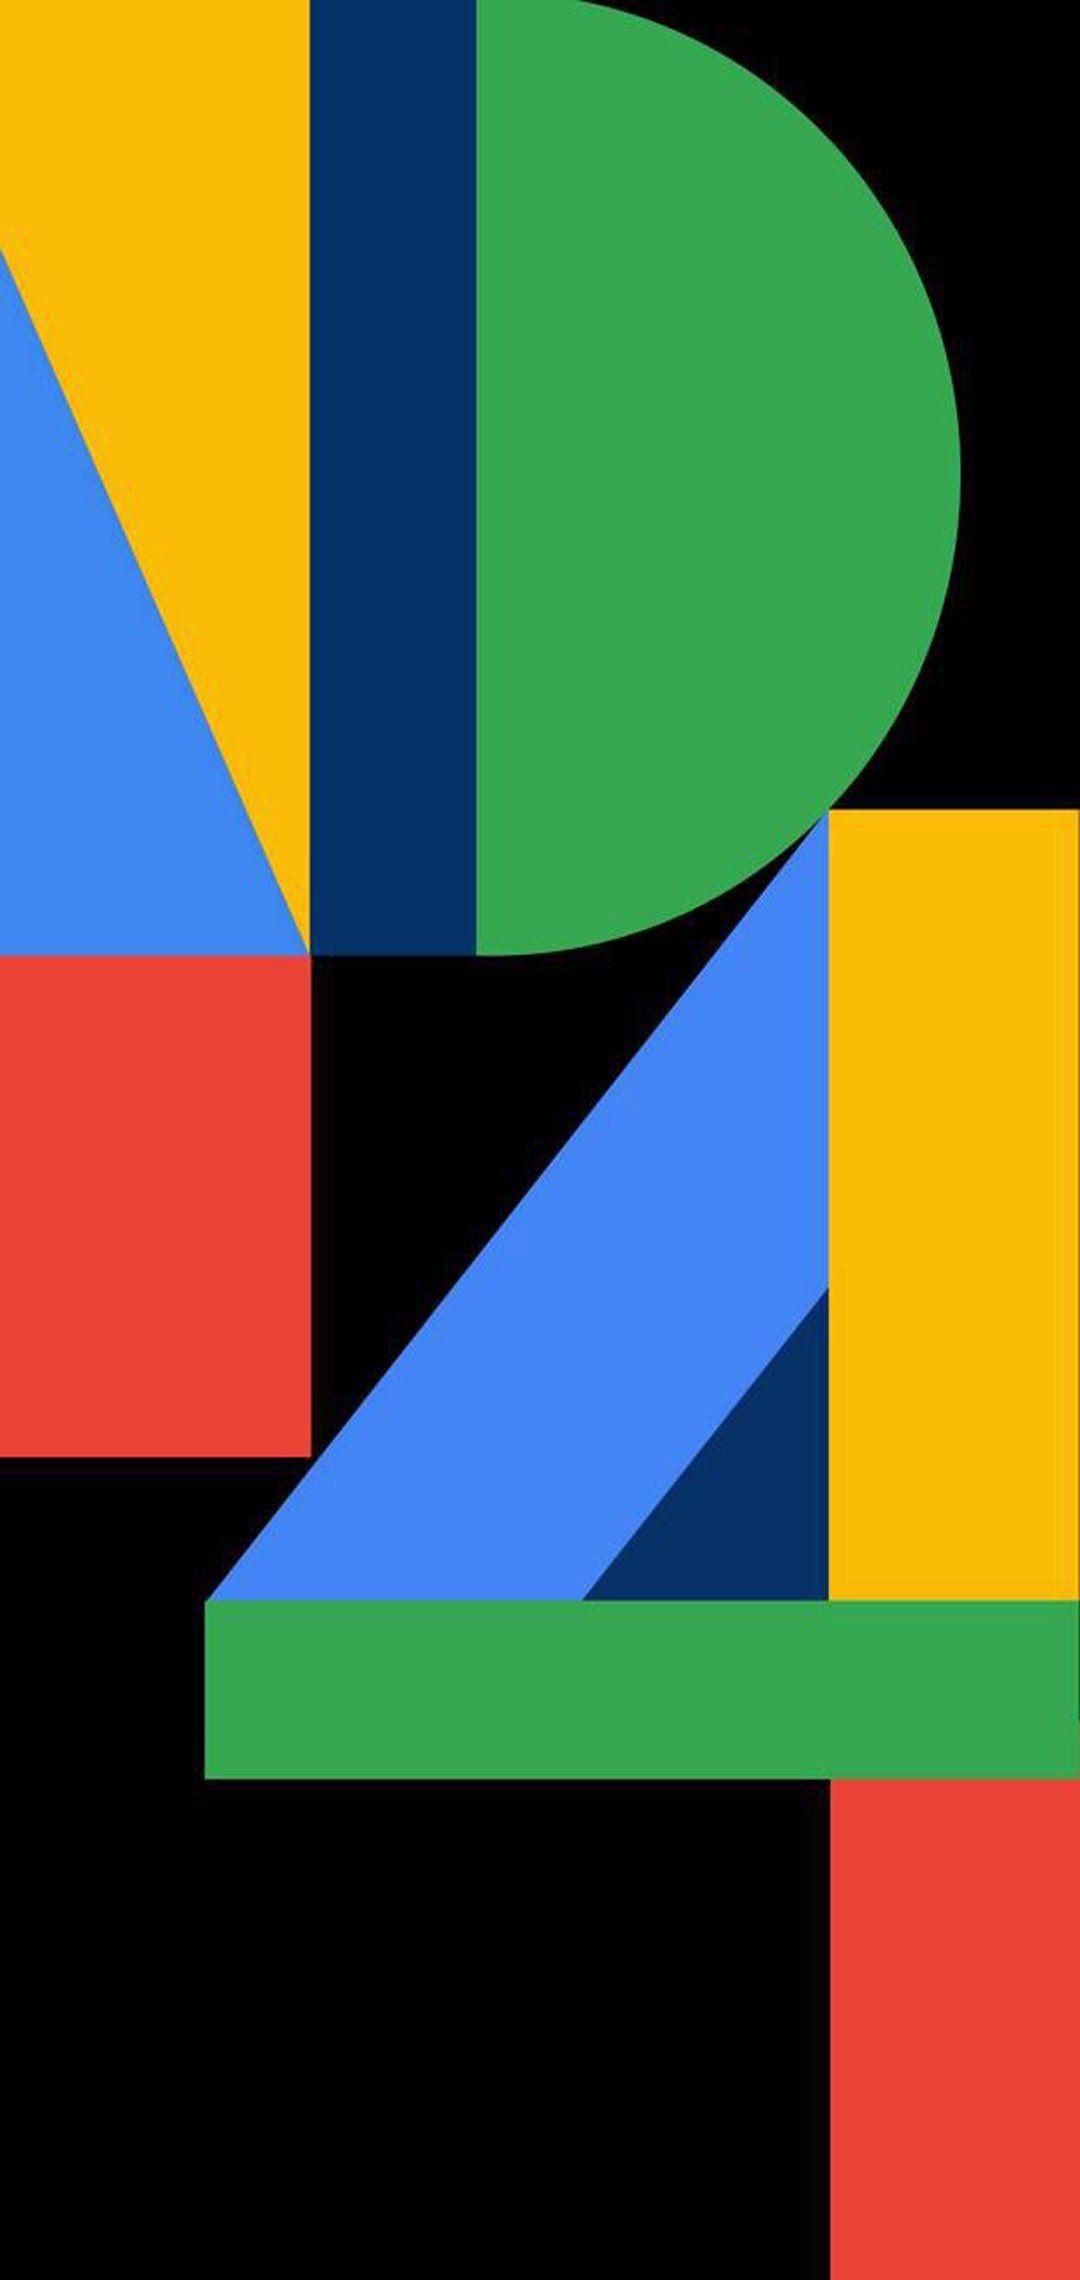 Google Pixel 4 Google Pixel Wallpaper Stock Wallpaper Pixel